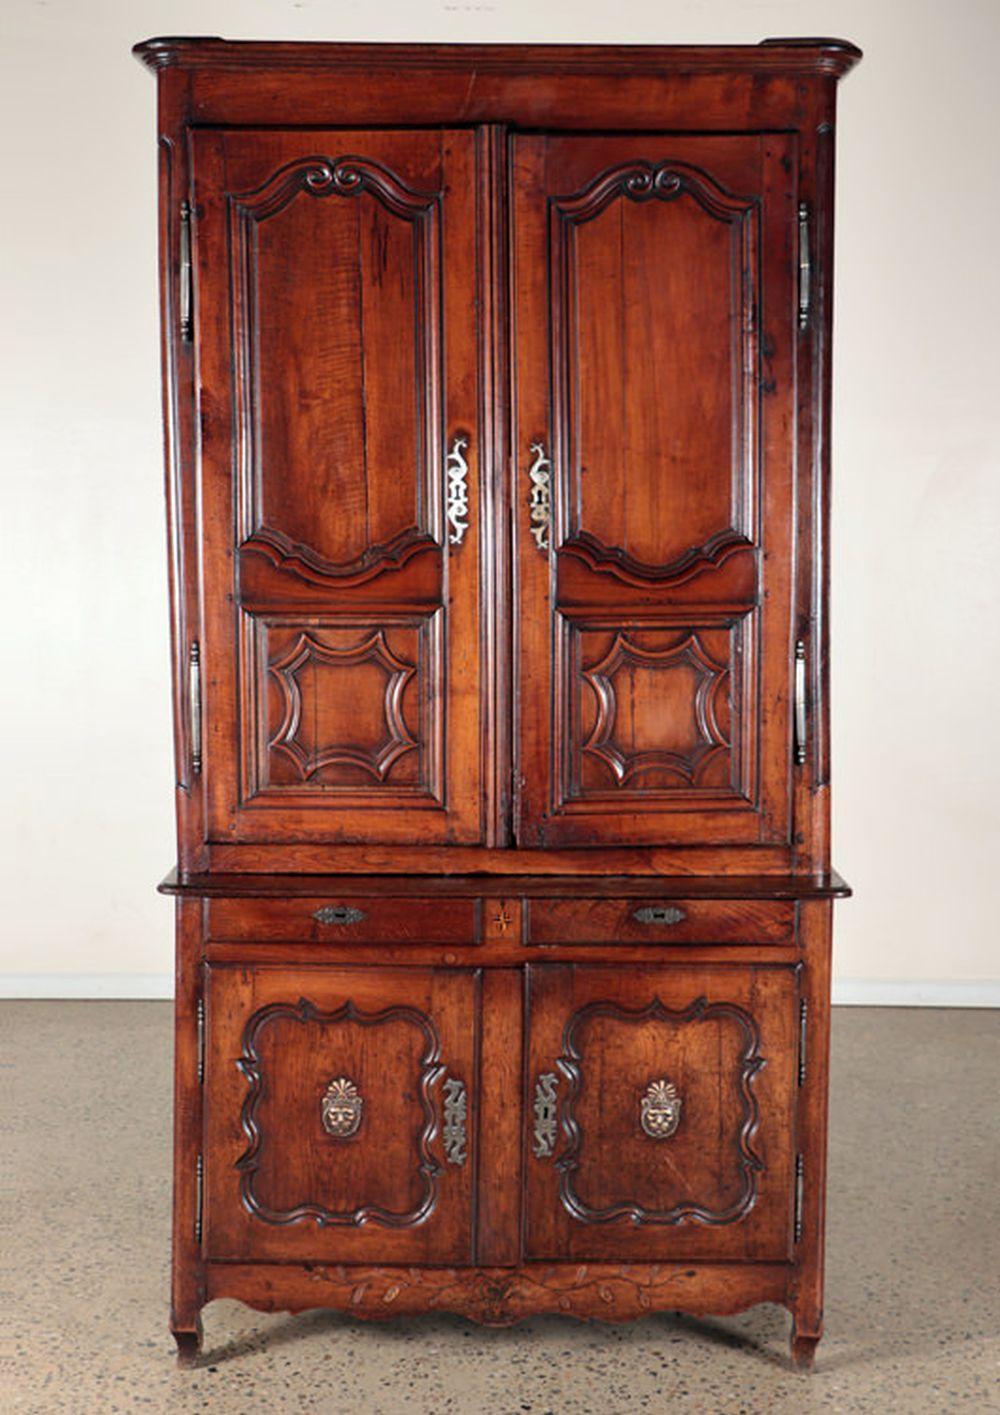 FRENCH OAK 18TH C. 2-PART CABINET PANELED DOORS